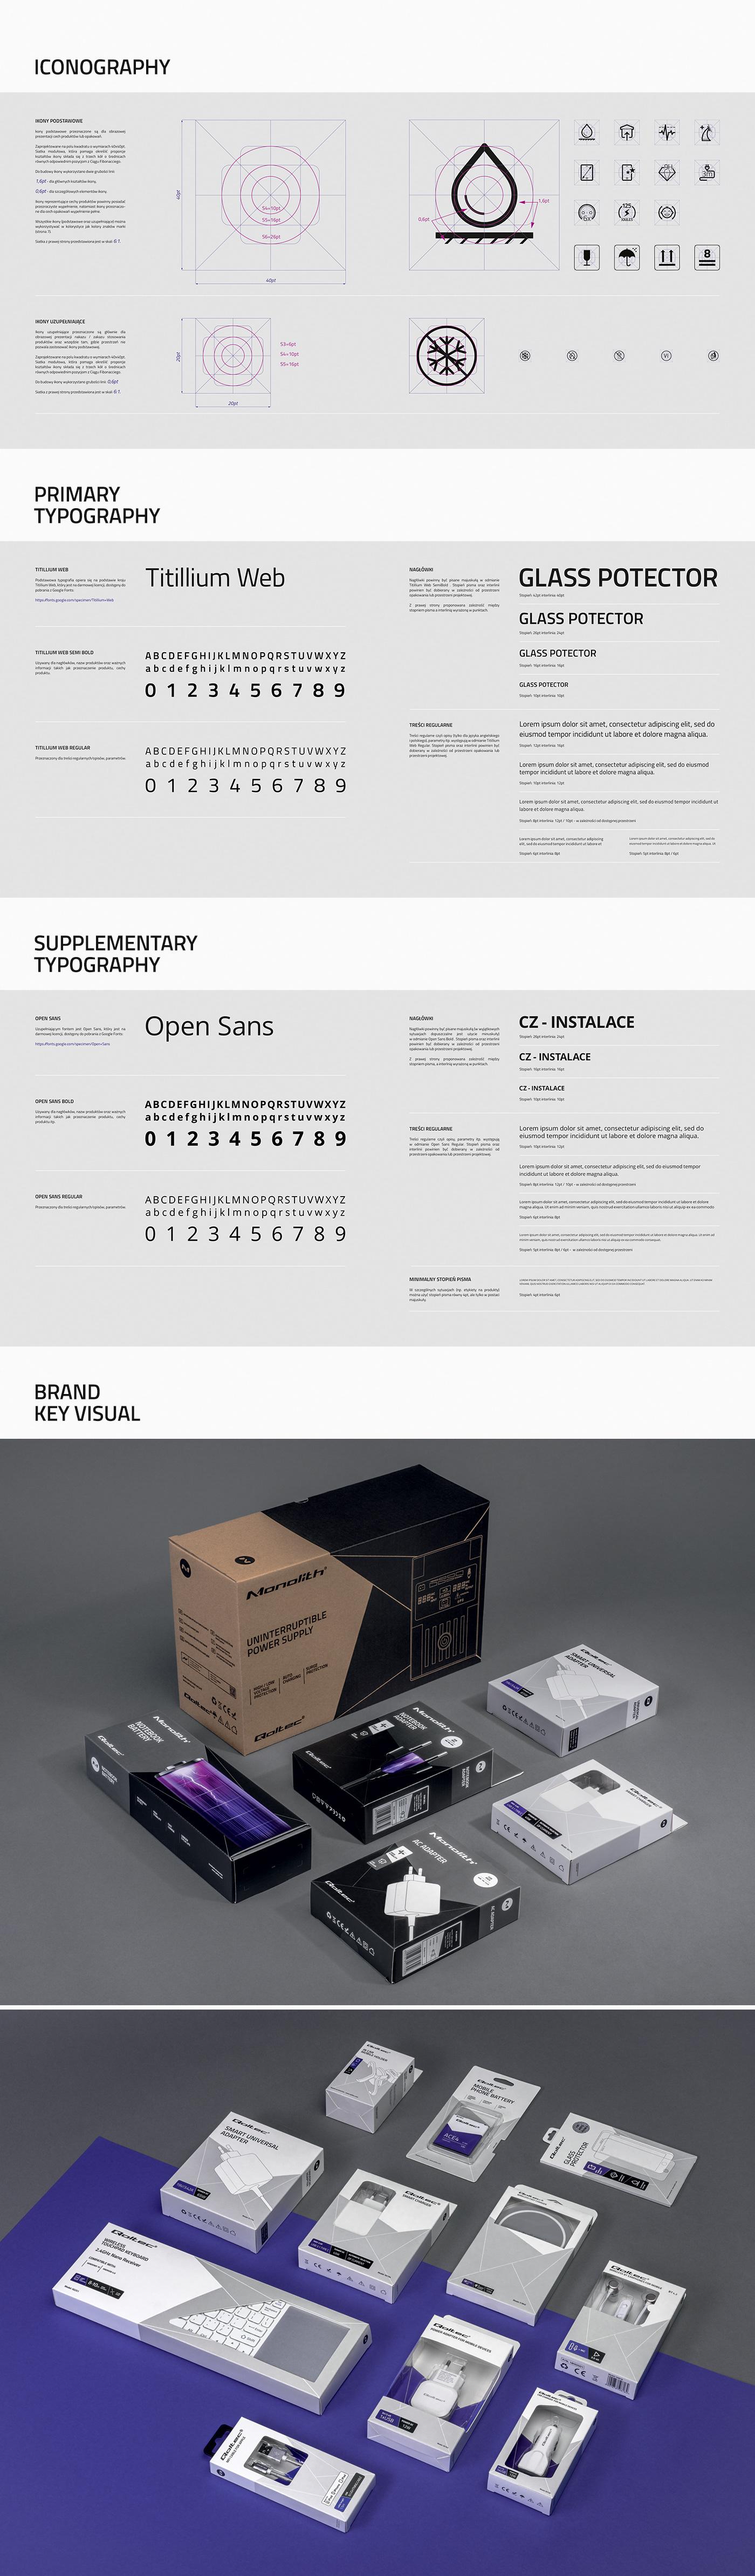 challenge,qoltec,monolith,Packaging,guidelines,packaging manual,dobies,skinder